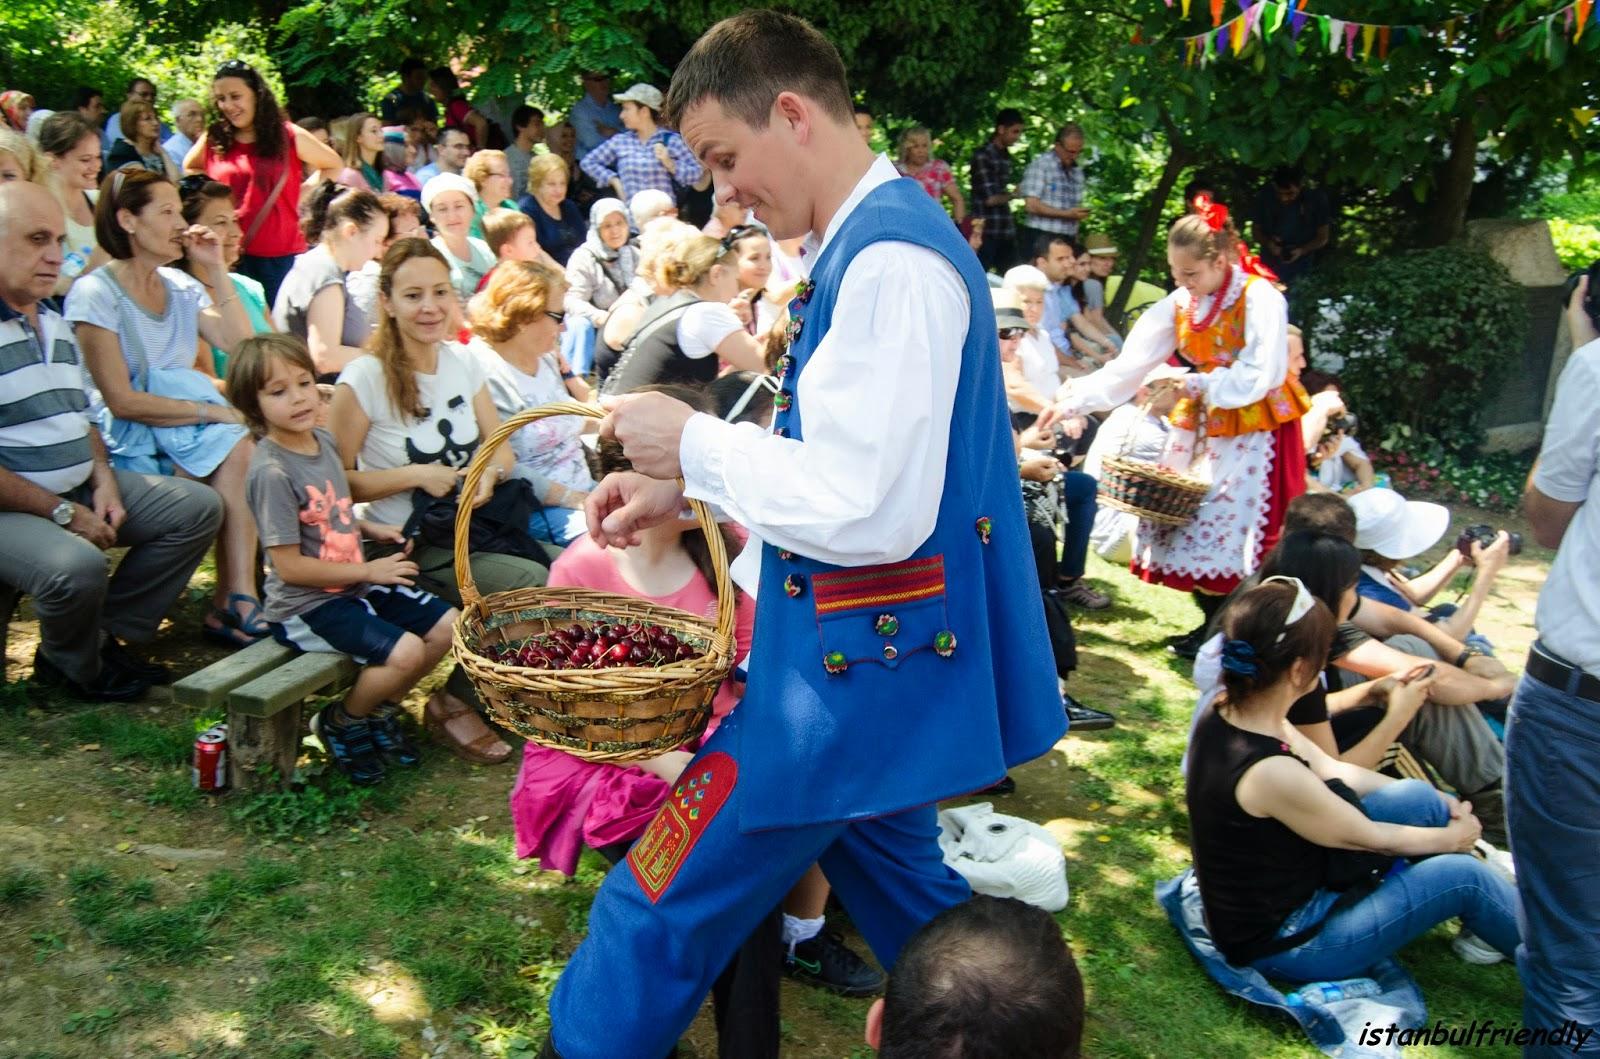 Polish festival, Polonezkoy